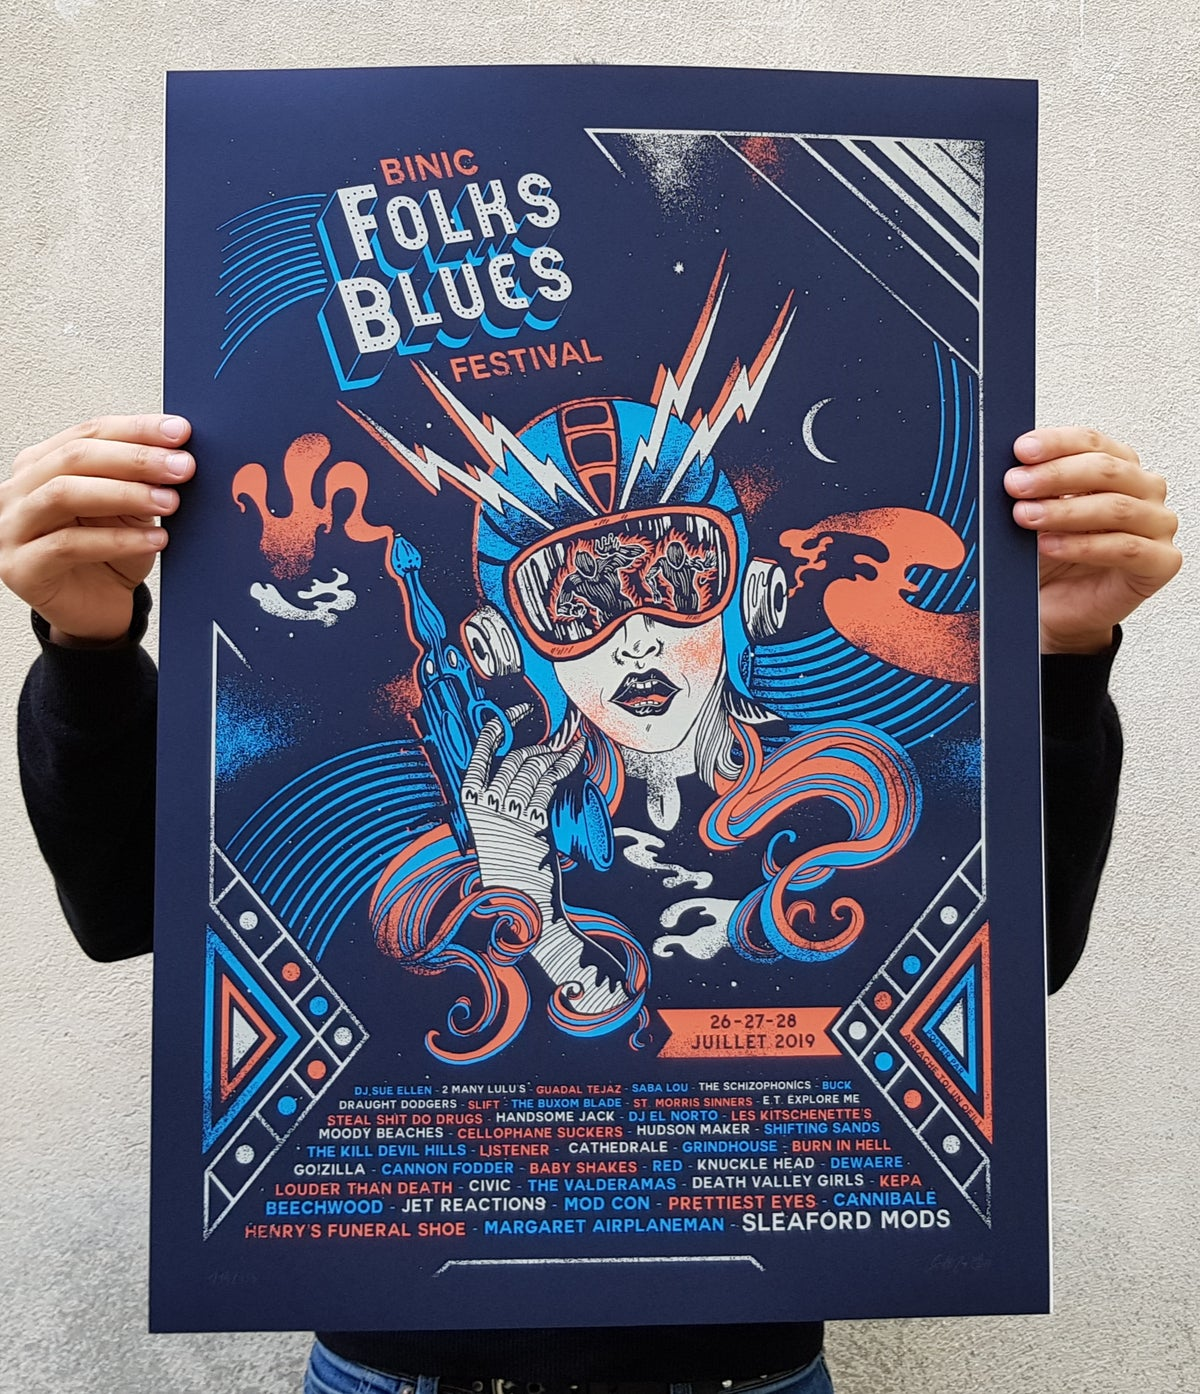 BINIC FOLK BLUES festival 2019 (screenprinted poster)